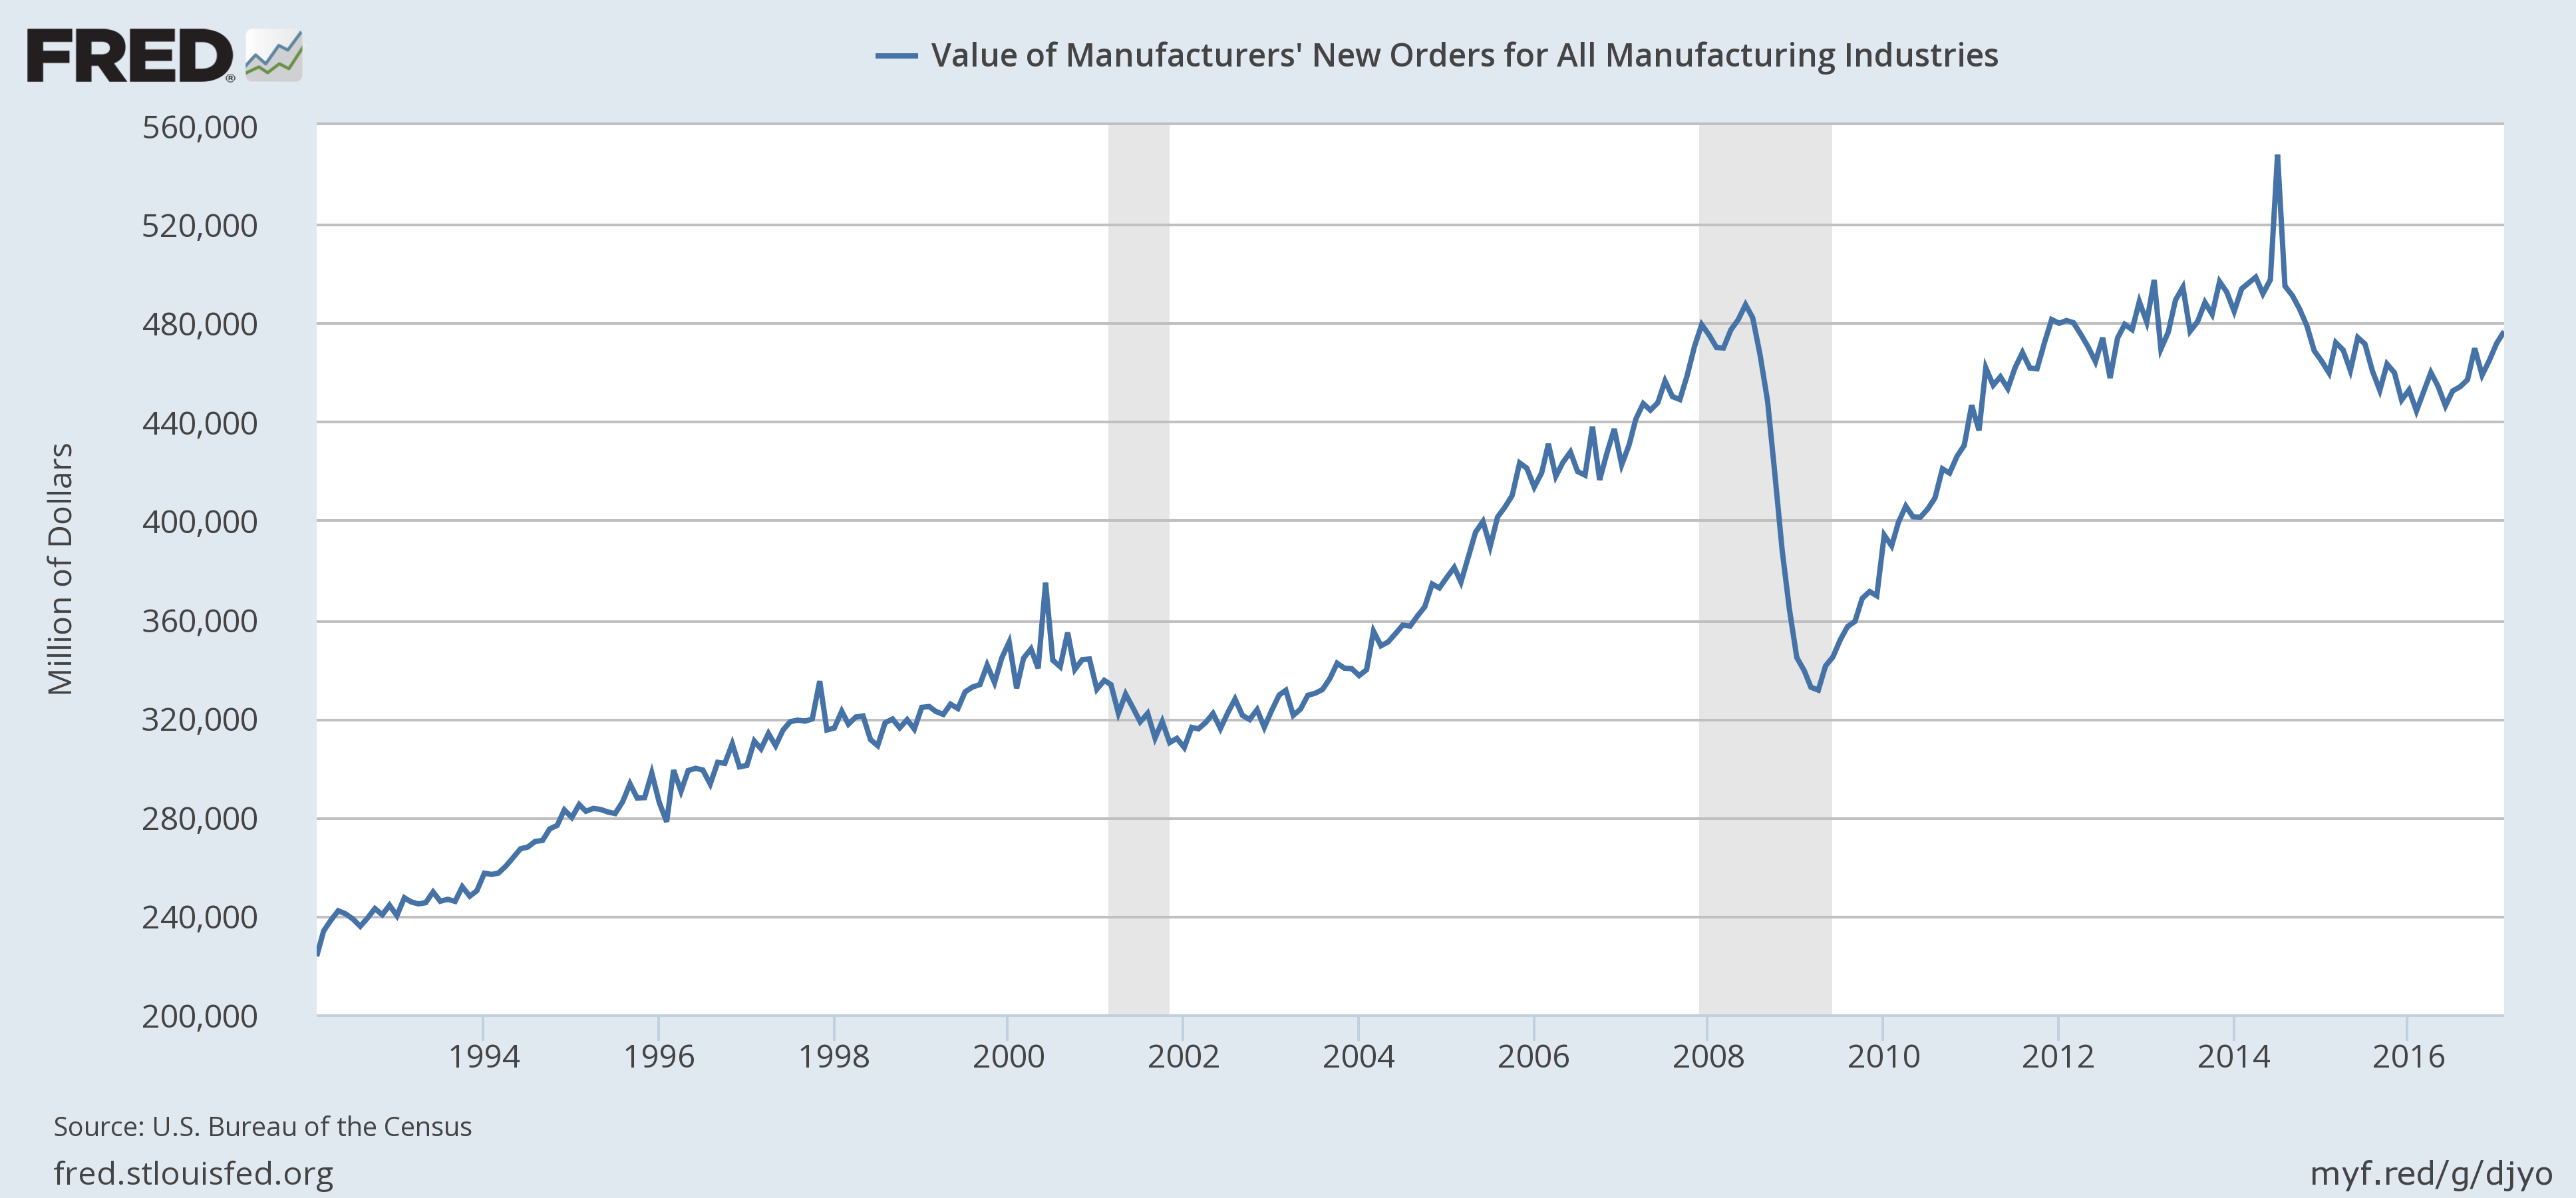 US New Orders, 1994 - 2016